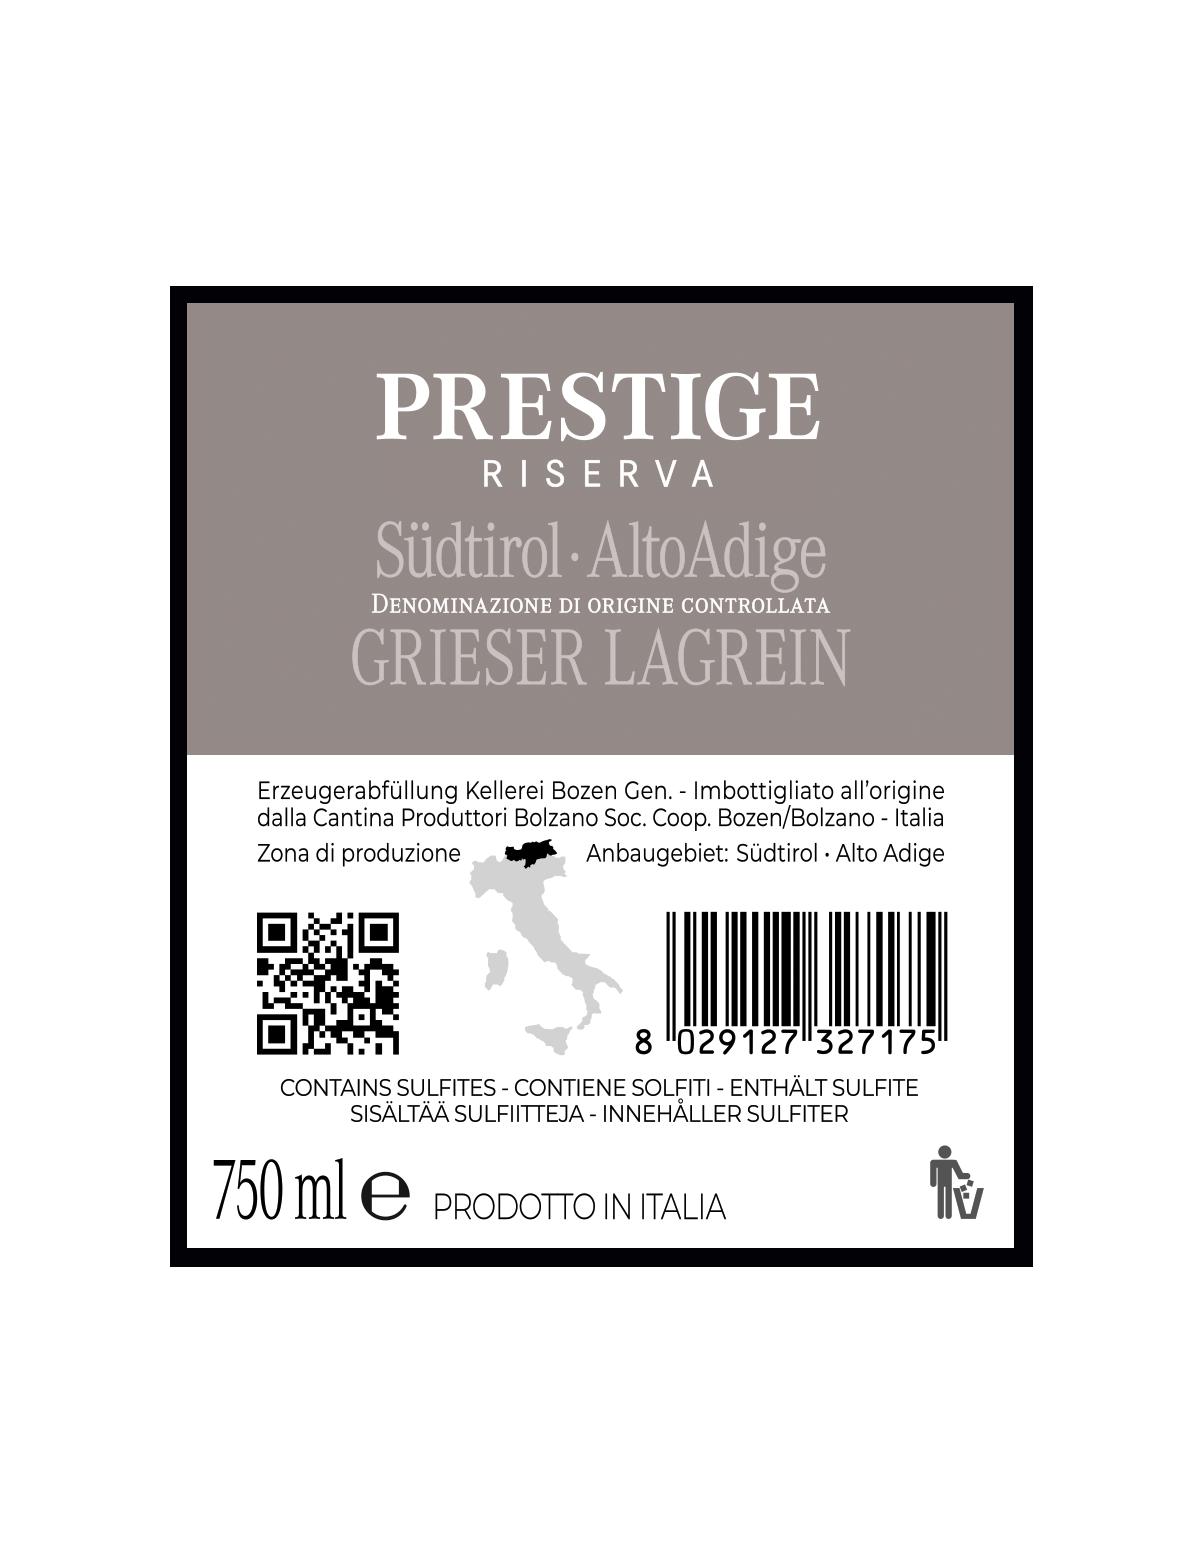 PRESTIGE GRIESER LAGREIN RISERVA Südtirol • Alto Adige DOC 2018